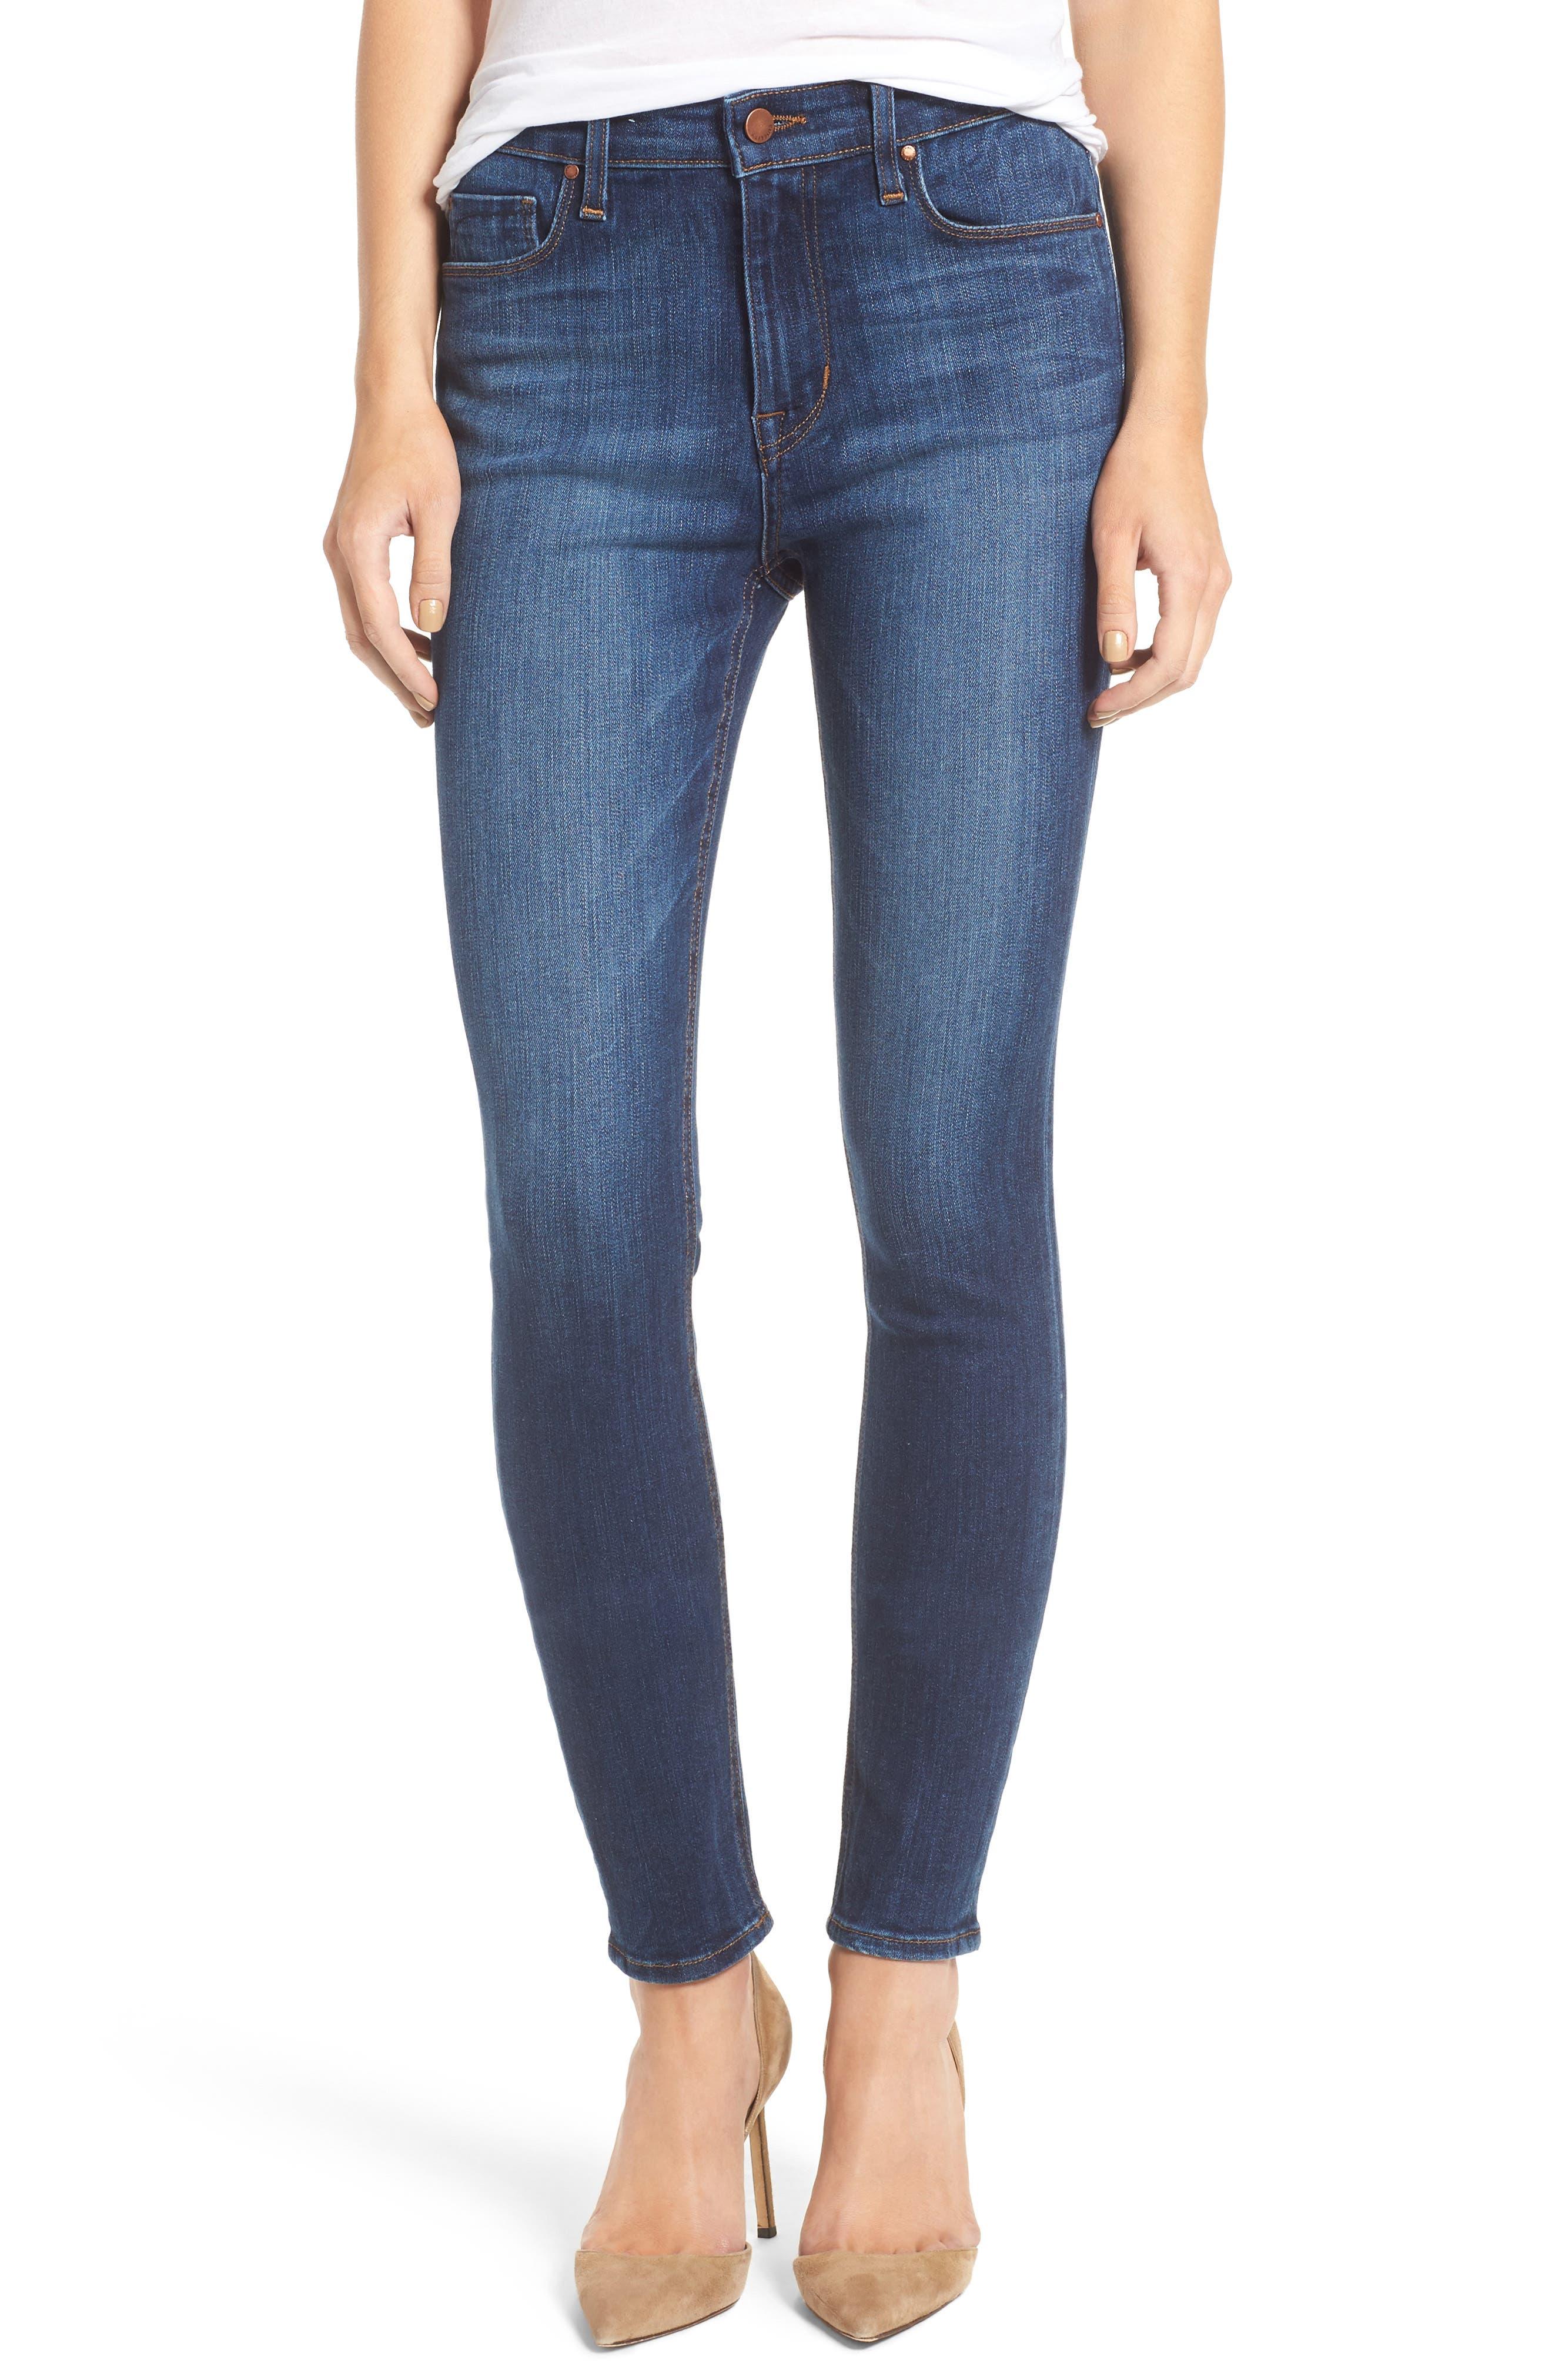 FIDELITY DENIM Gwen High Waist Skinny Jeans